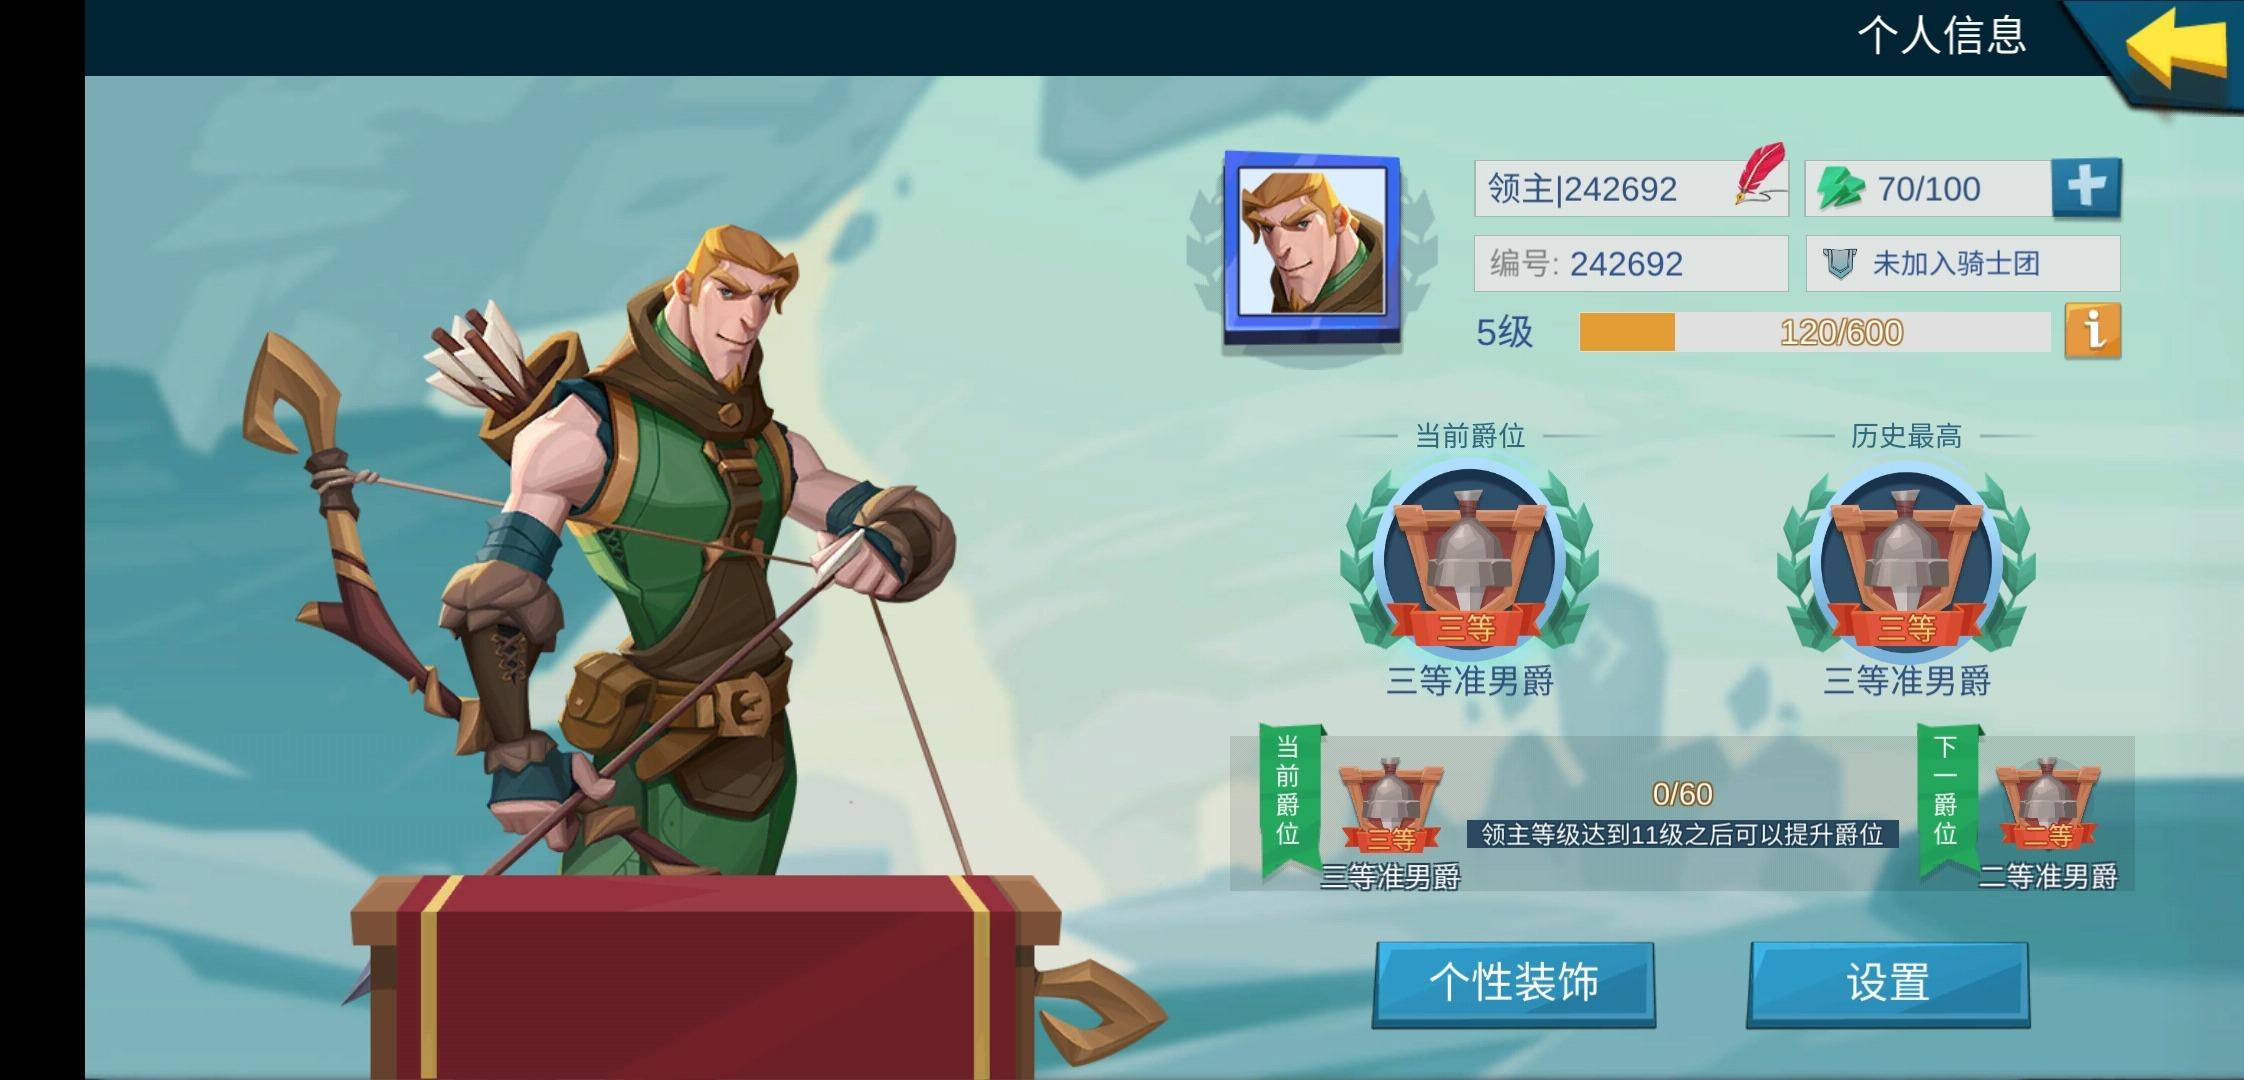 Screenshot_2021-06-01-17-02-12-685_com.jedigames.p21.guanwang.jpg